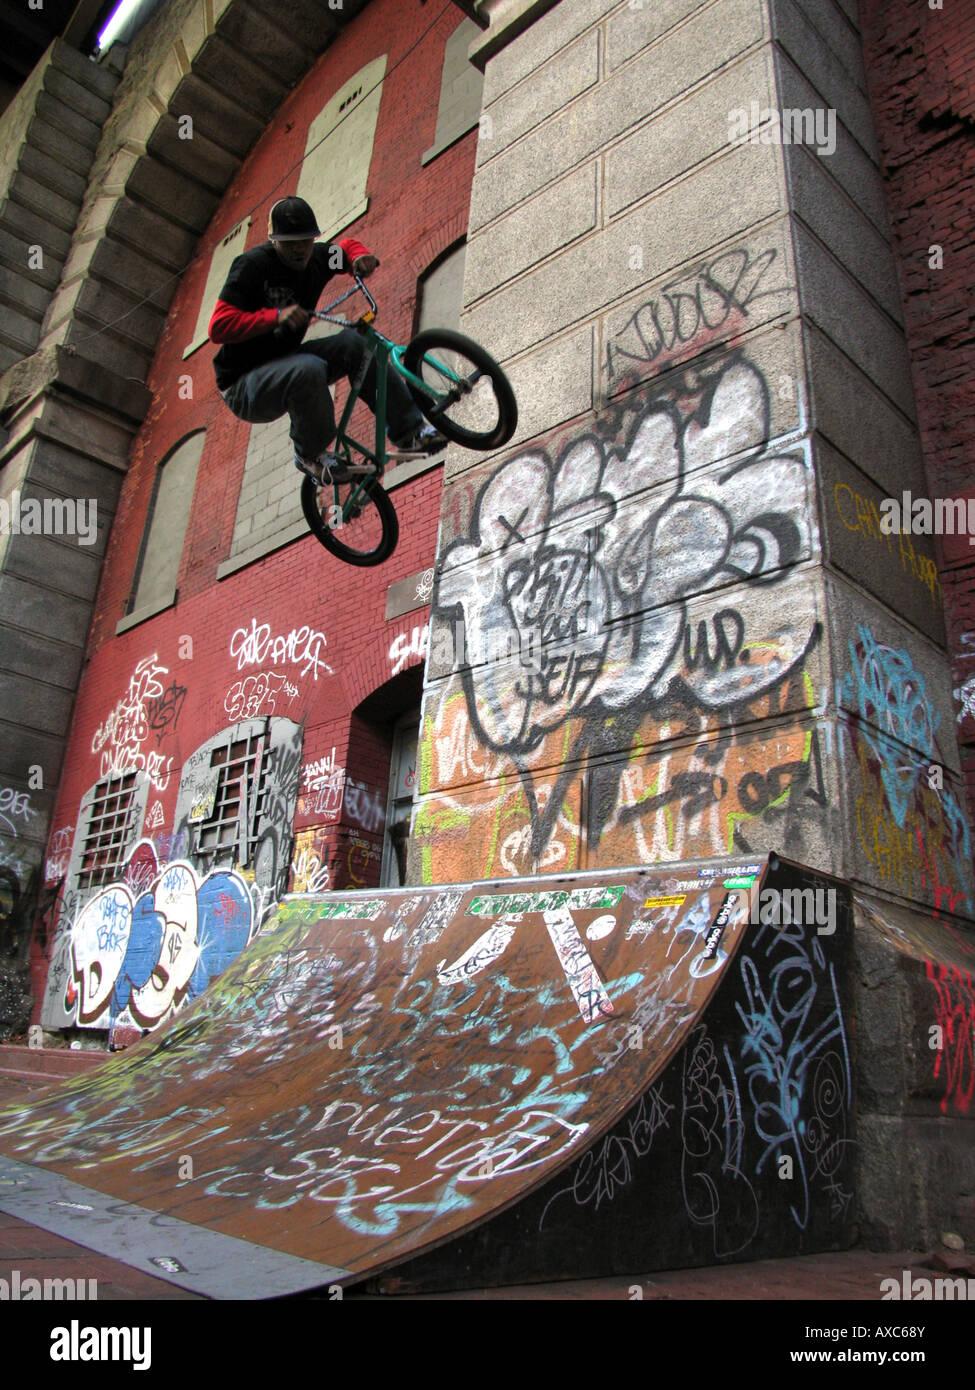 Graffiti wall usa - Bmx Rider After Jumping From Ramp In Front Of Wall With Graffiti Under The Manhattan Bridge Usa Manhatten New York